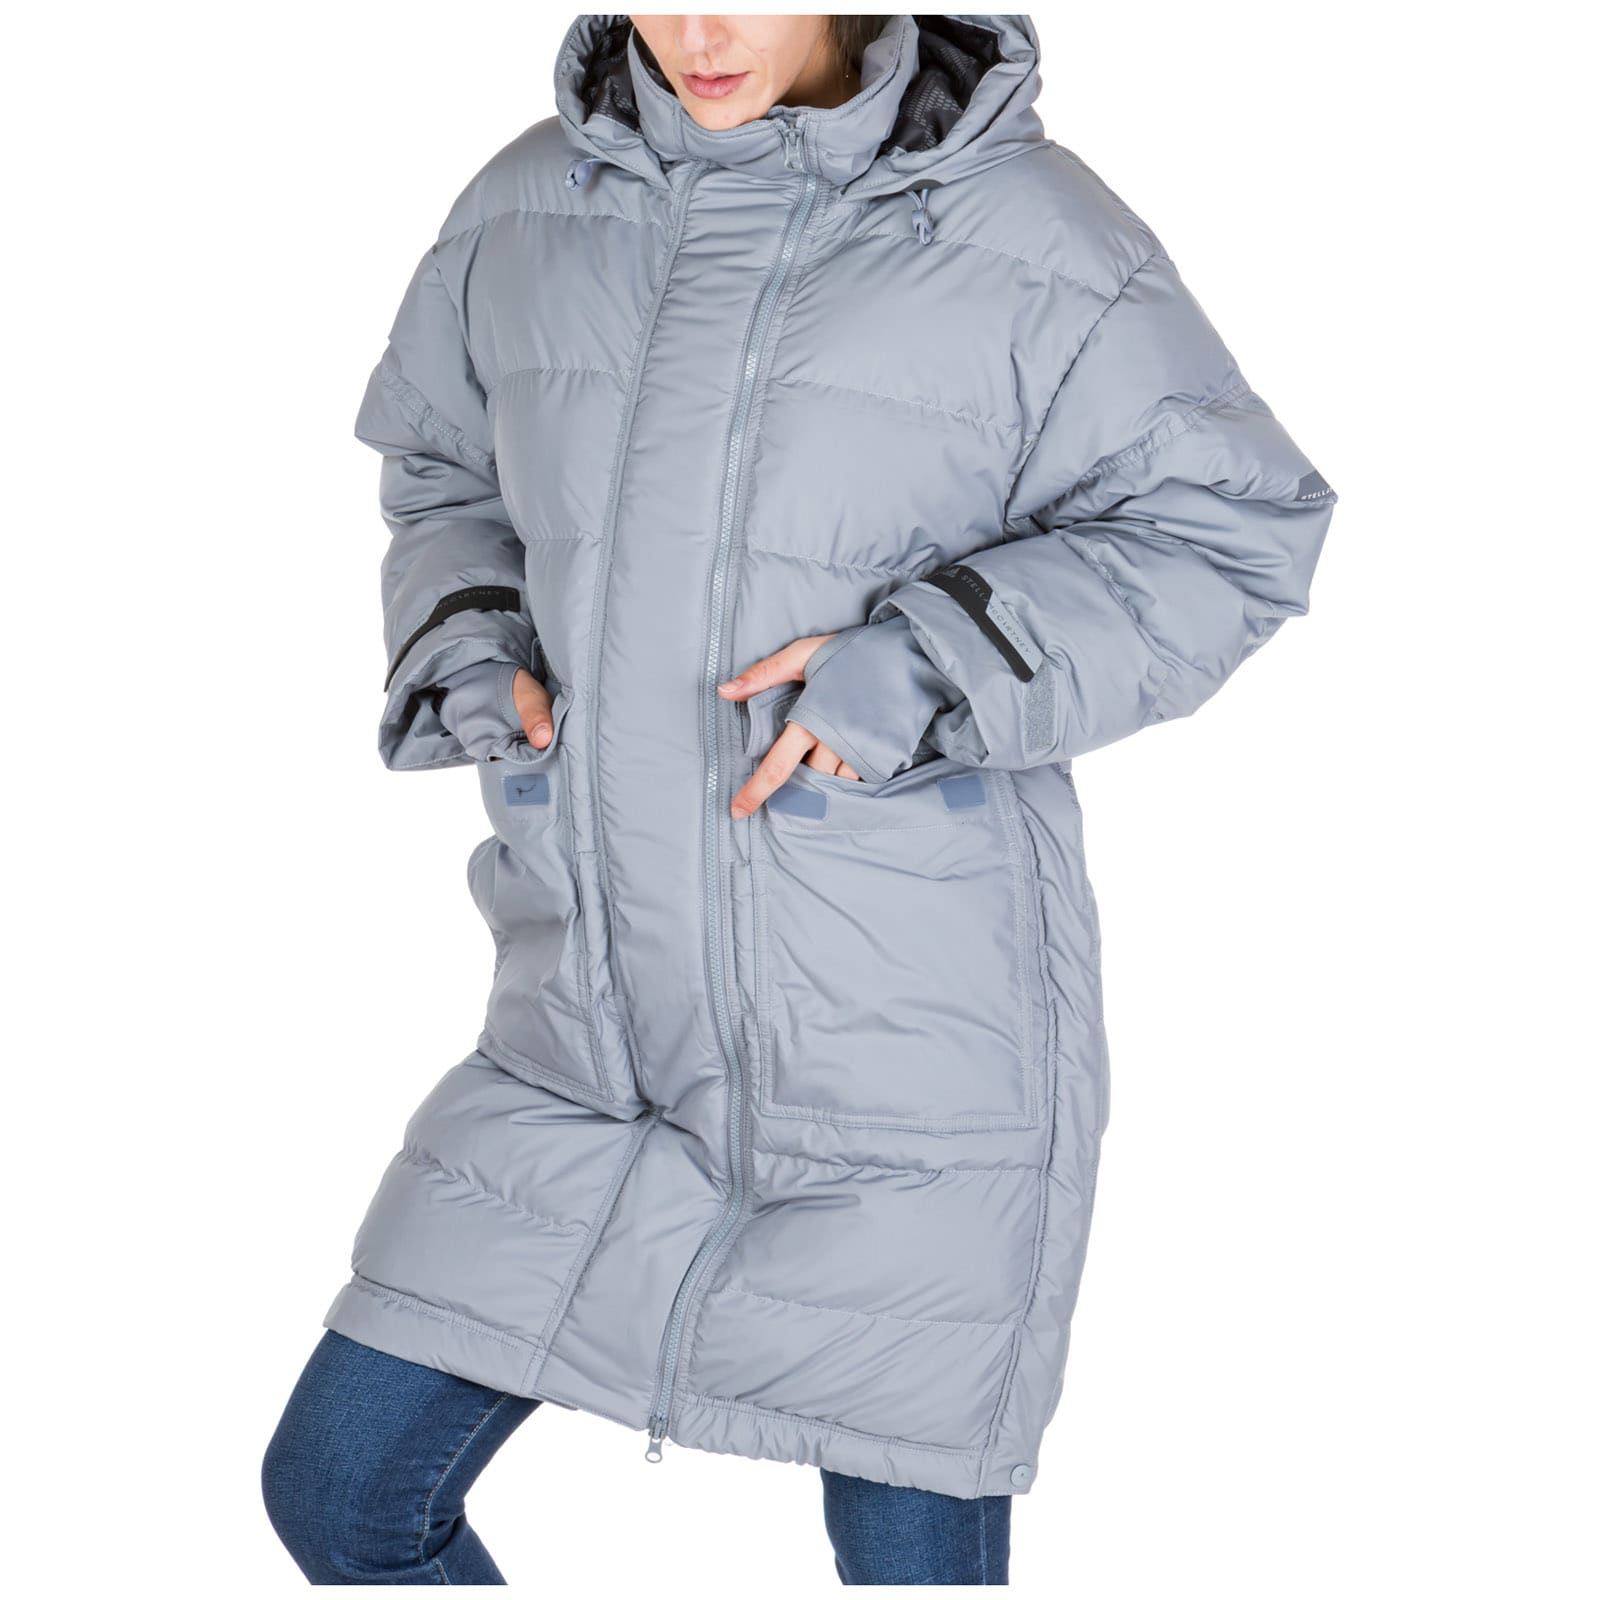 Adidas by Stella McCartney Outerwear Jacket Blouson Hood